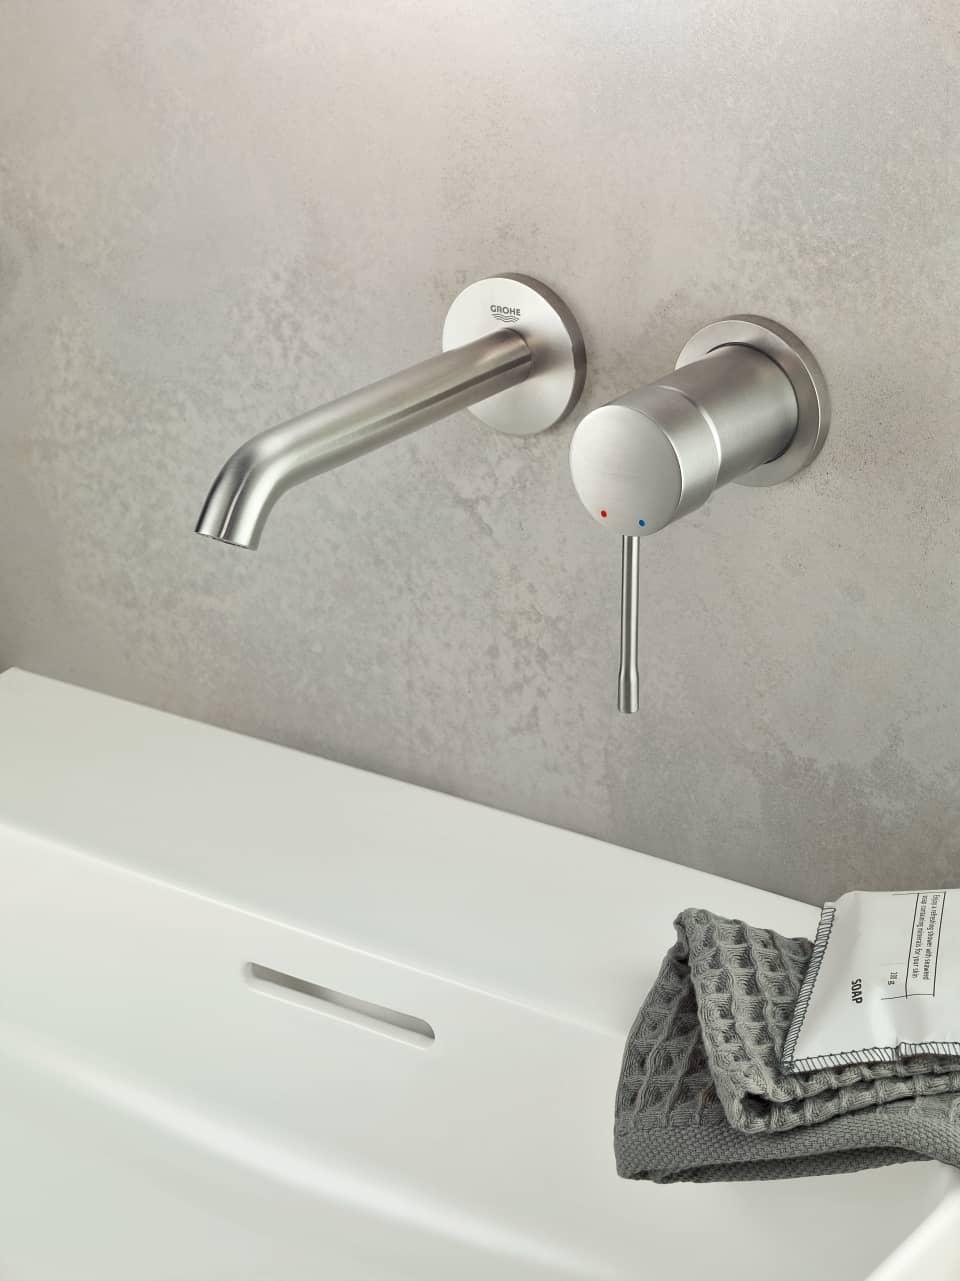 grohe-robinet